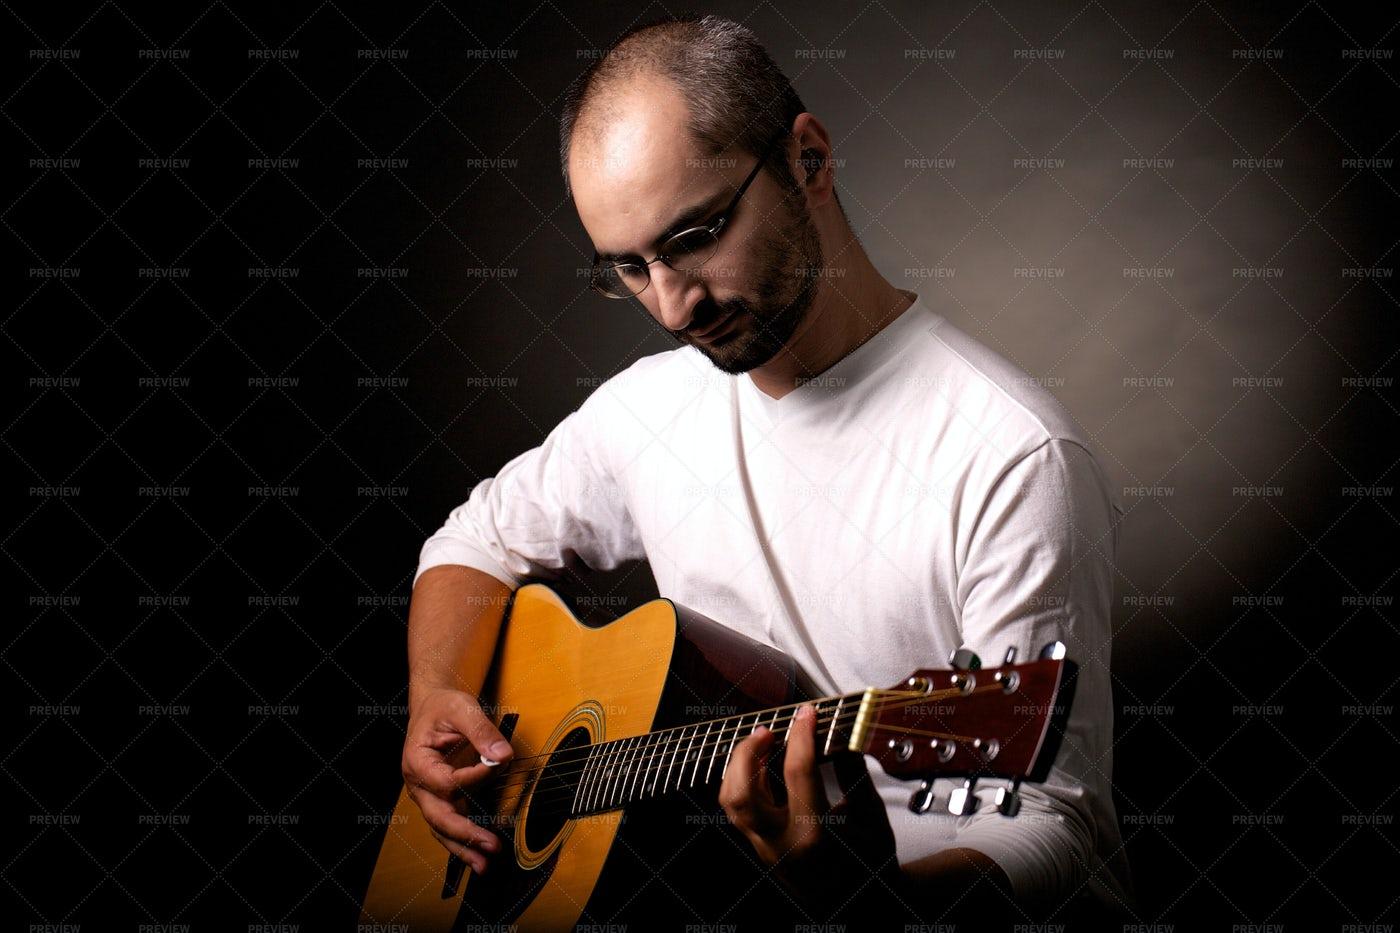 Playing Acoustic Guitar: Stock Photos